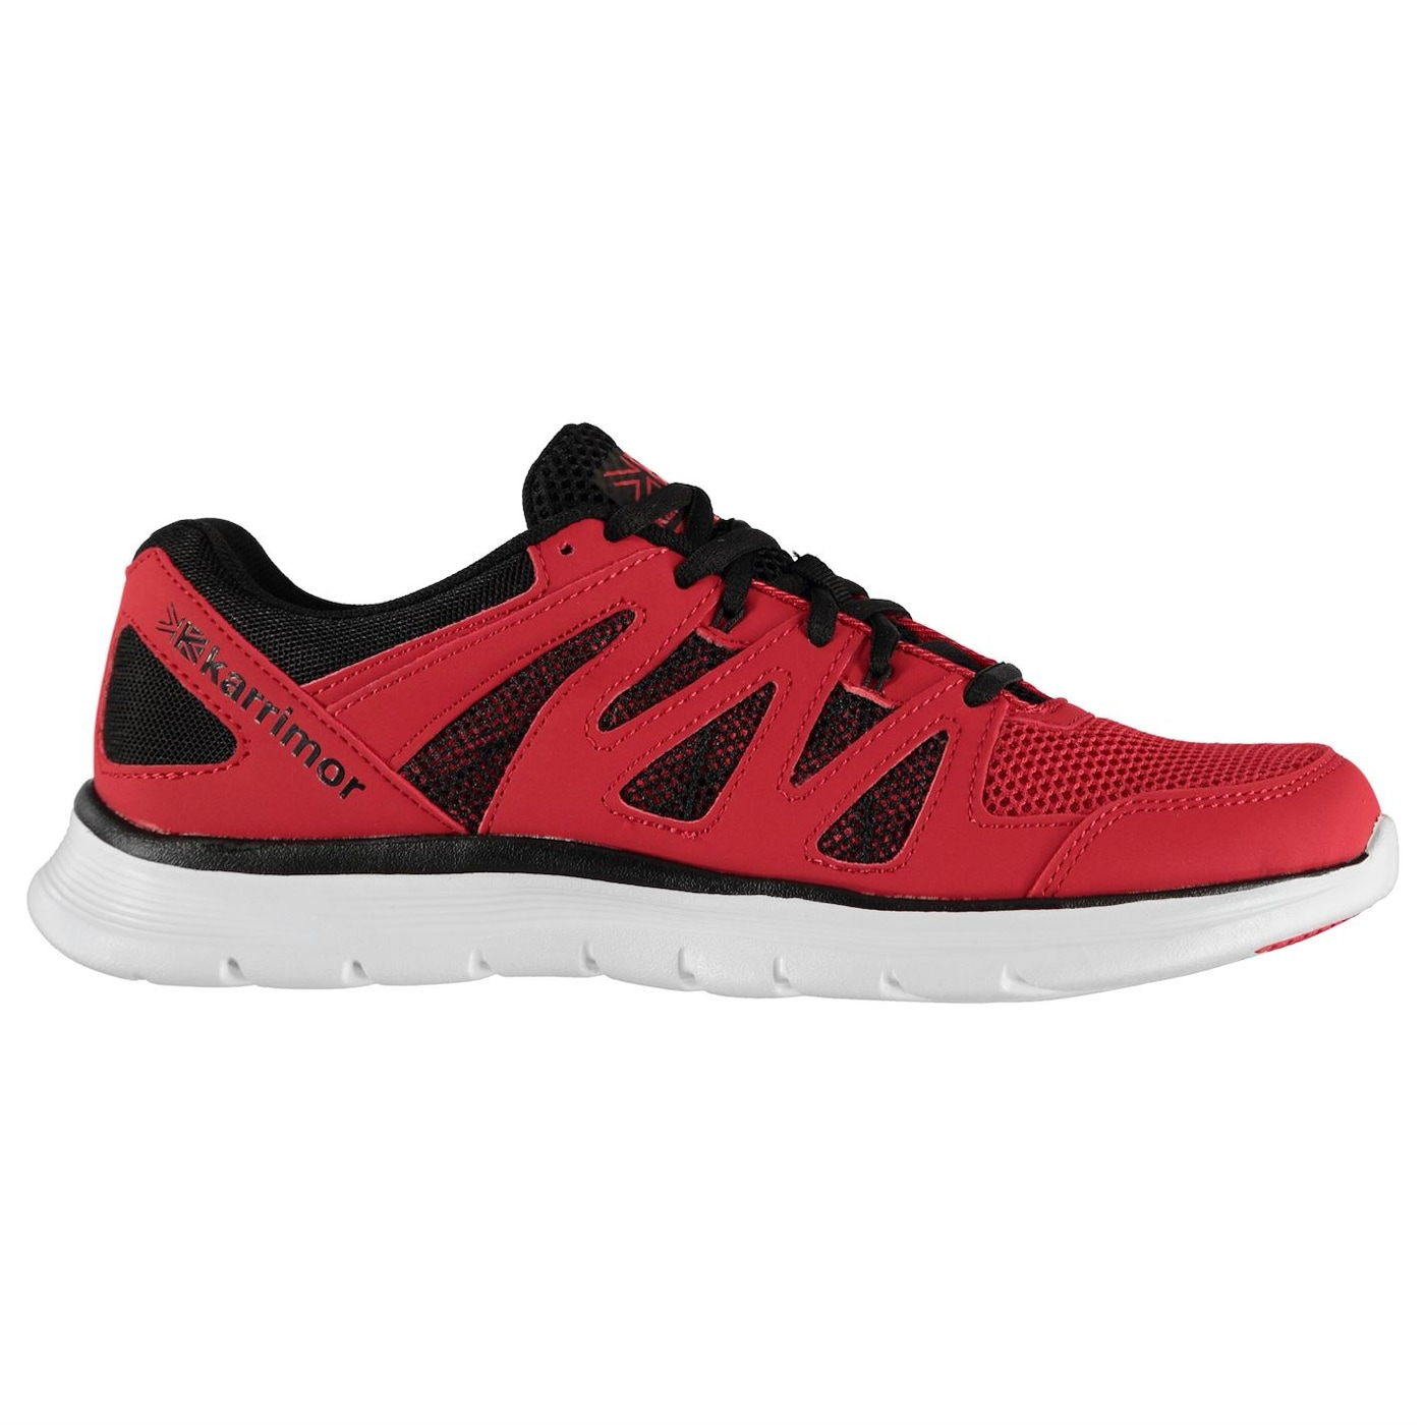 Karrimor Exerta 5 pánske bežecké tenisky